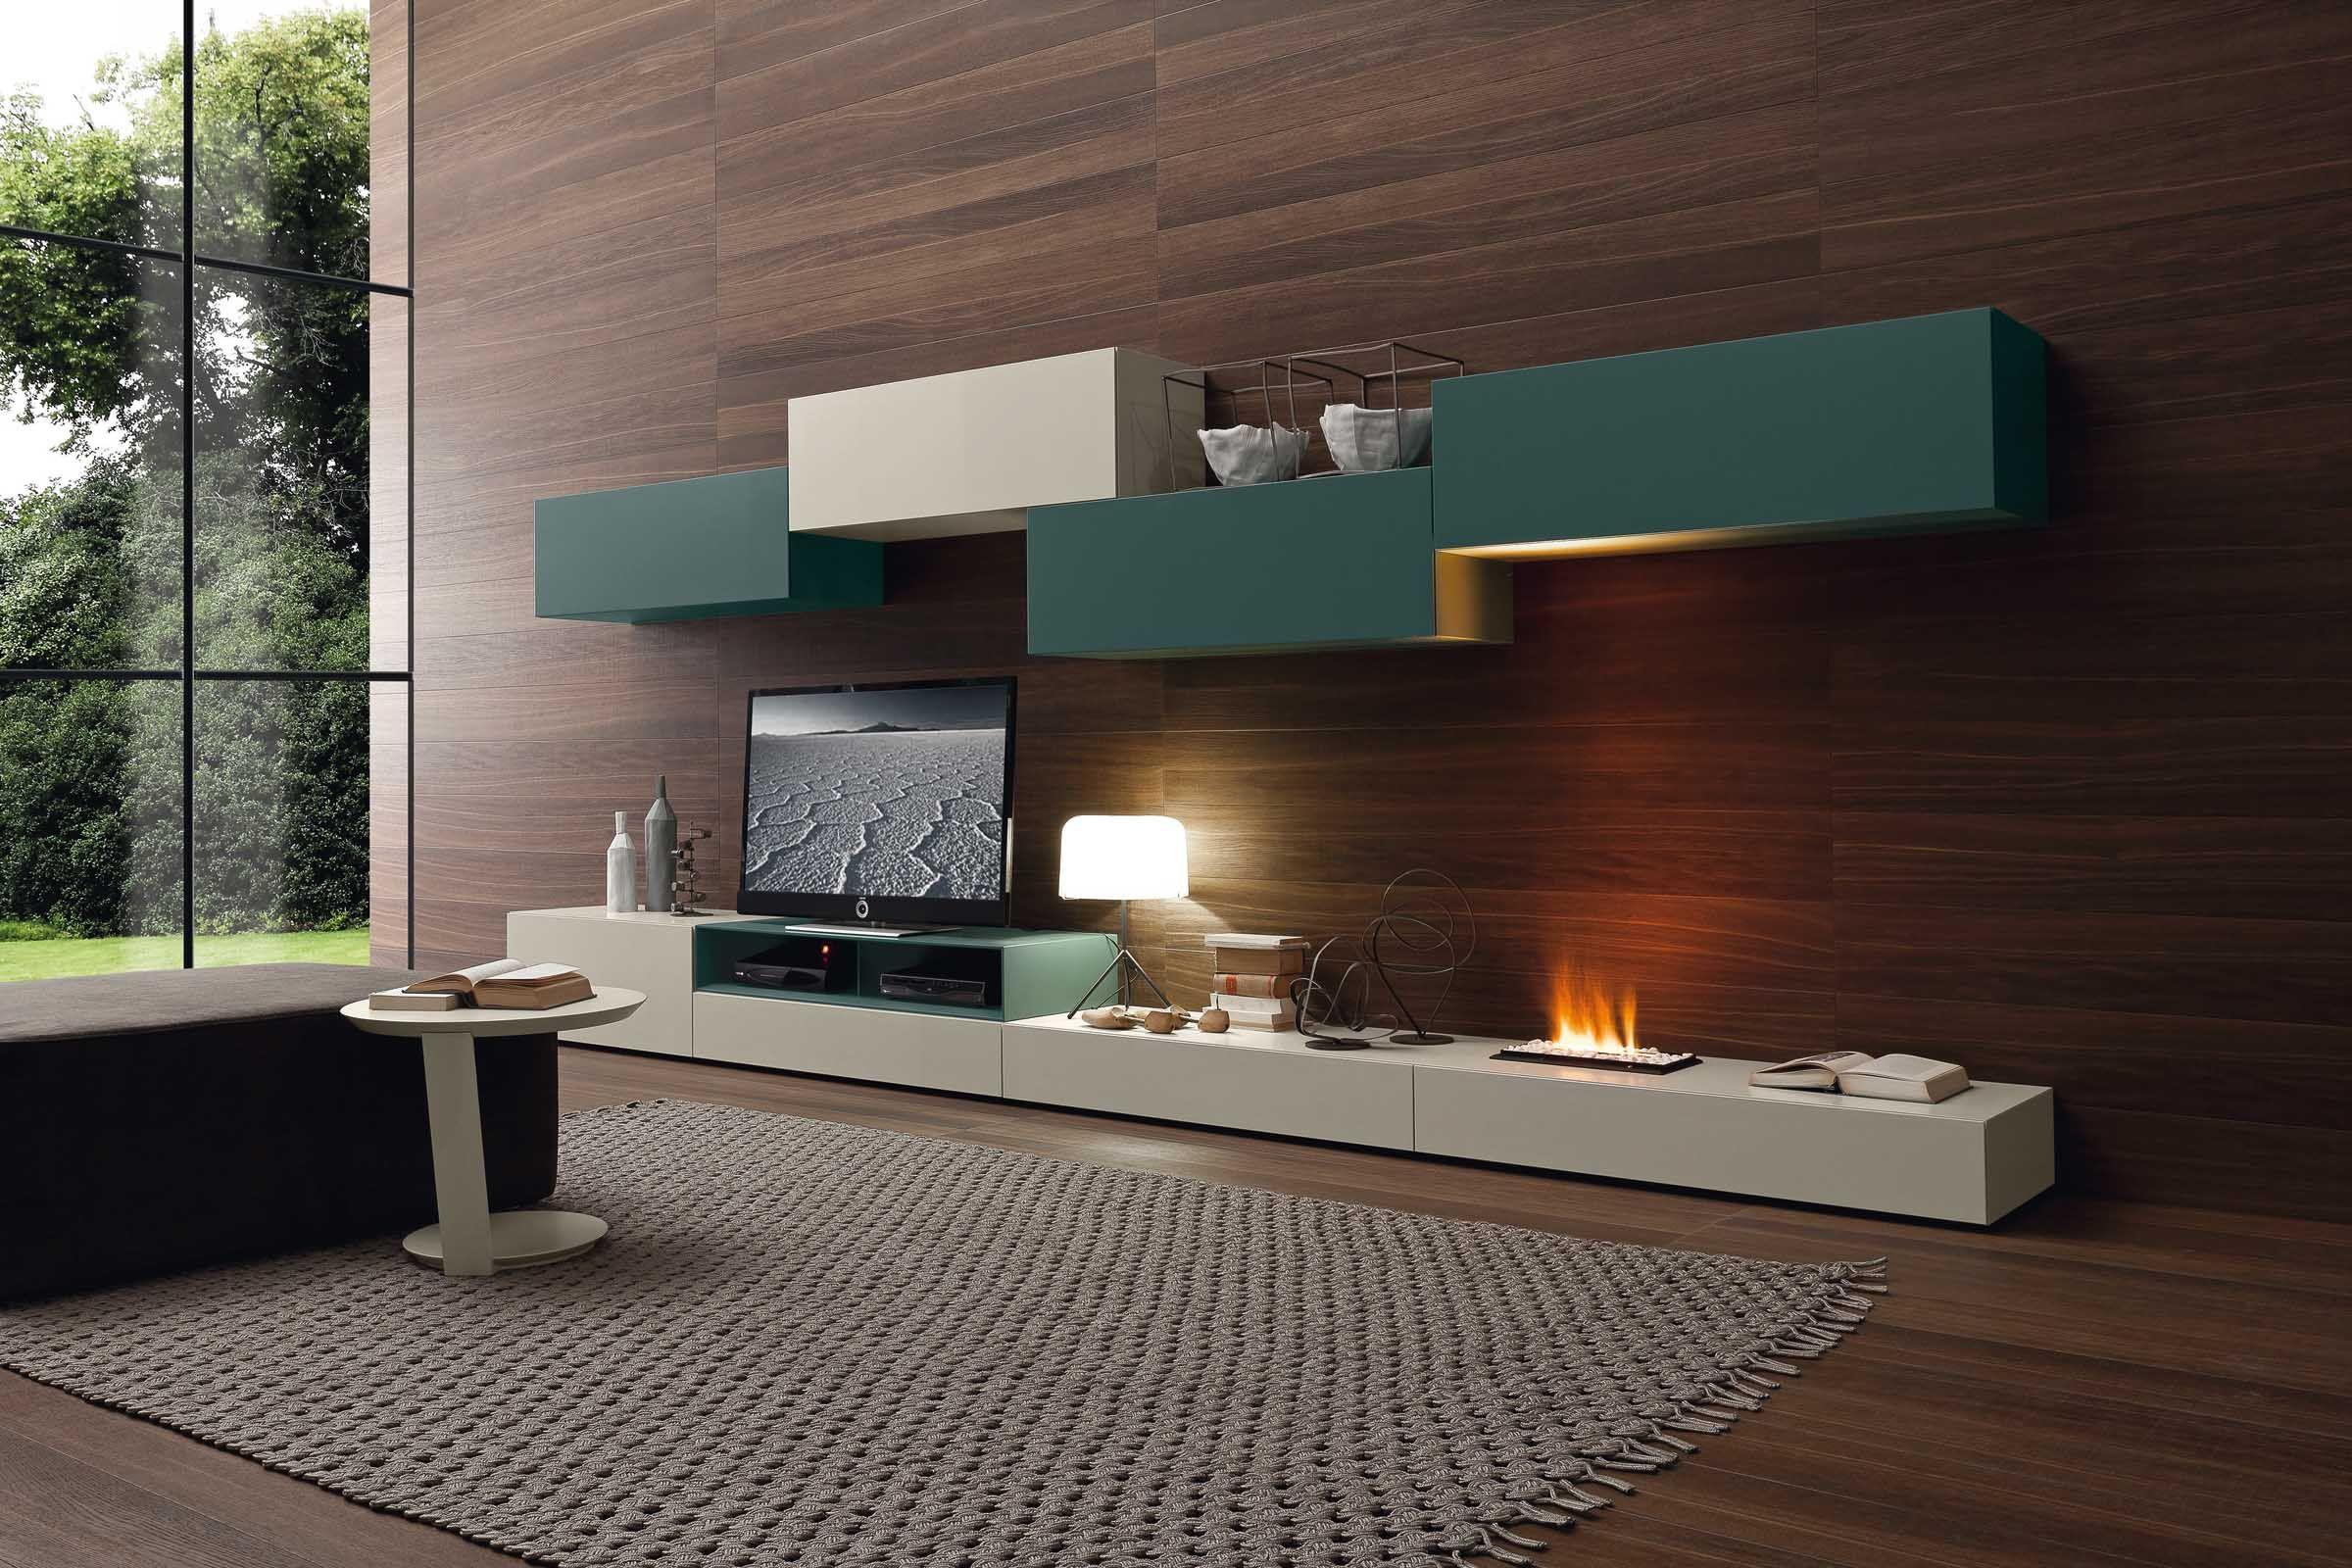 Soggiorno componibile moderno PR26 (With images) | Wall ...